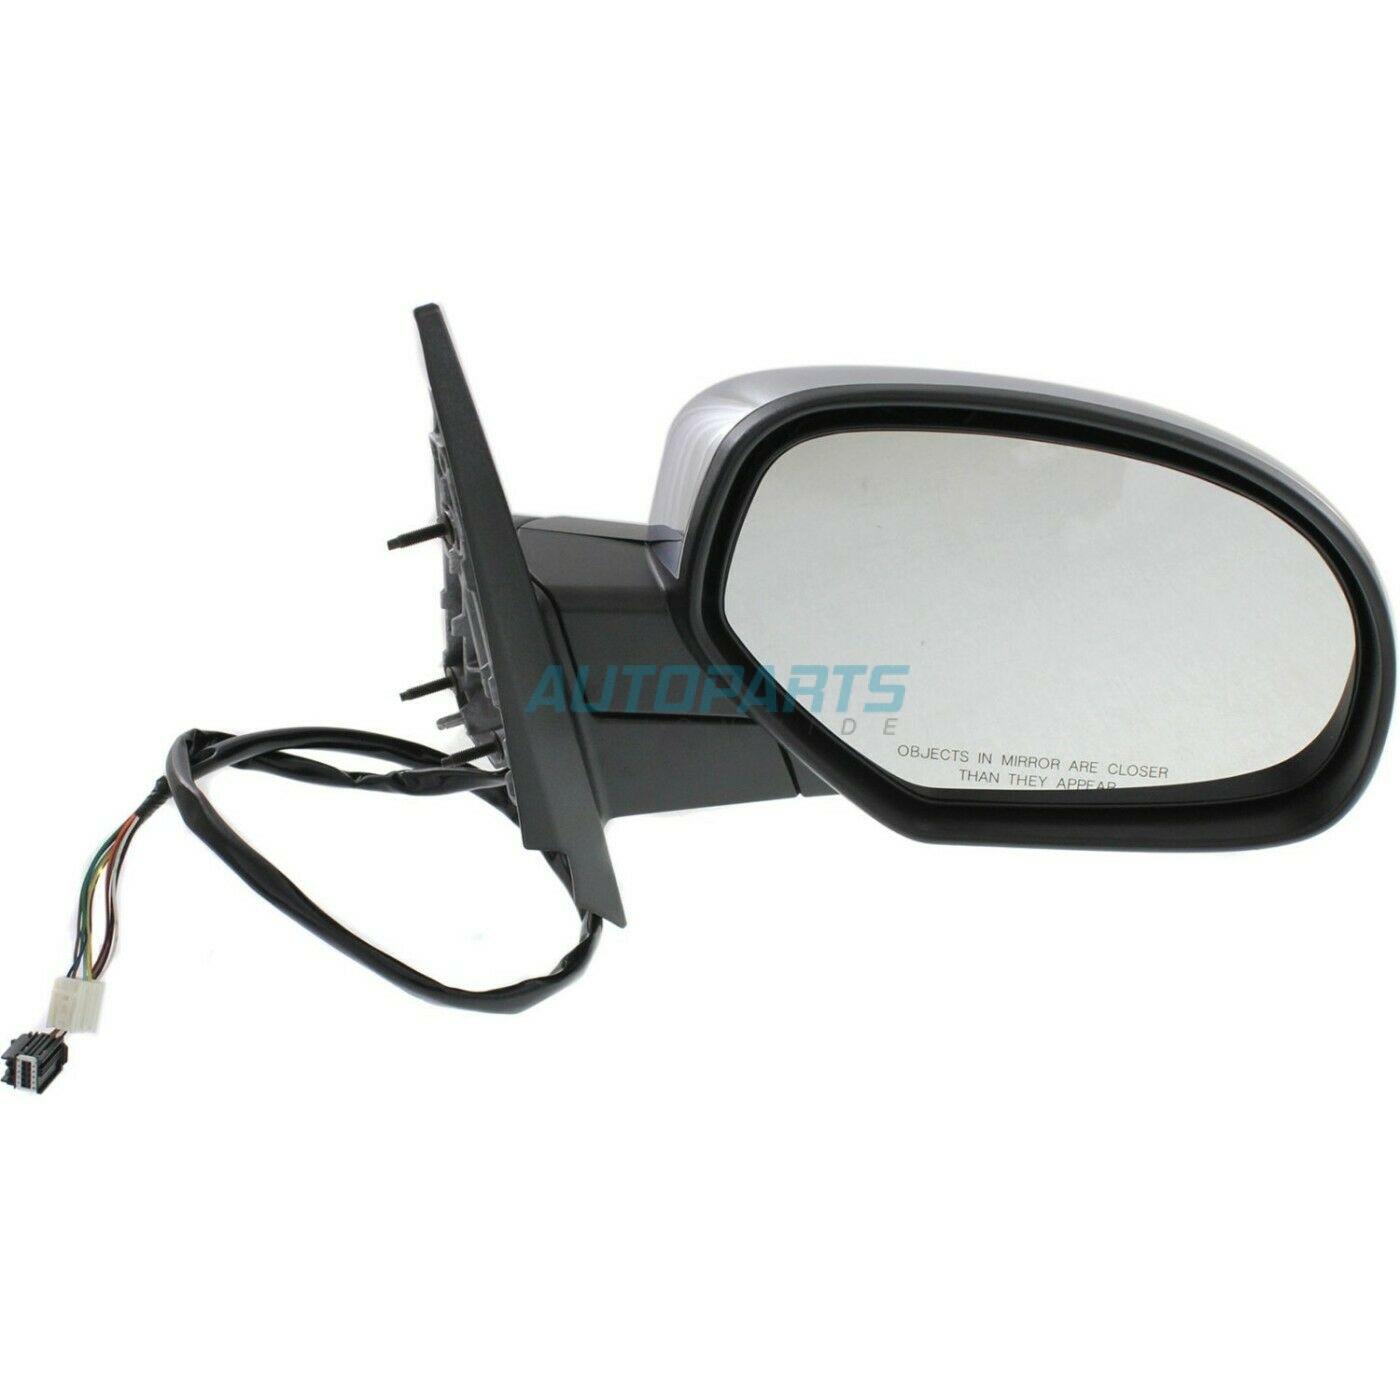 New Passenger Side Door Mirror For Chevrolet Suburban 1500 2007-2014